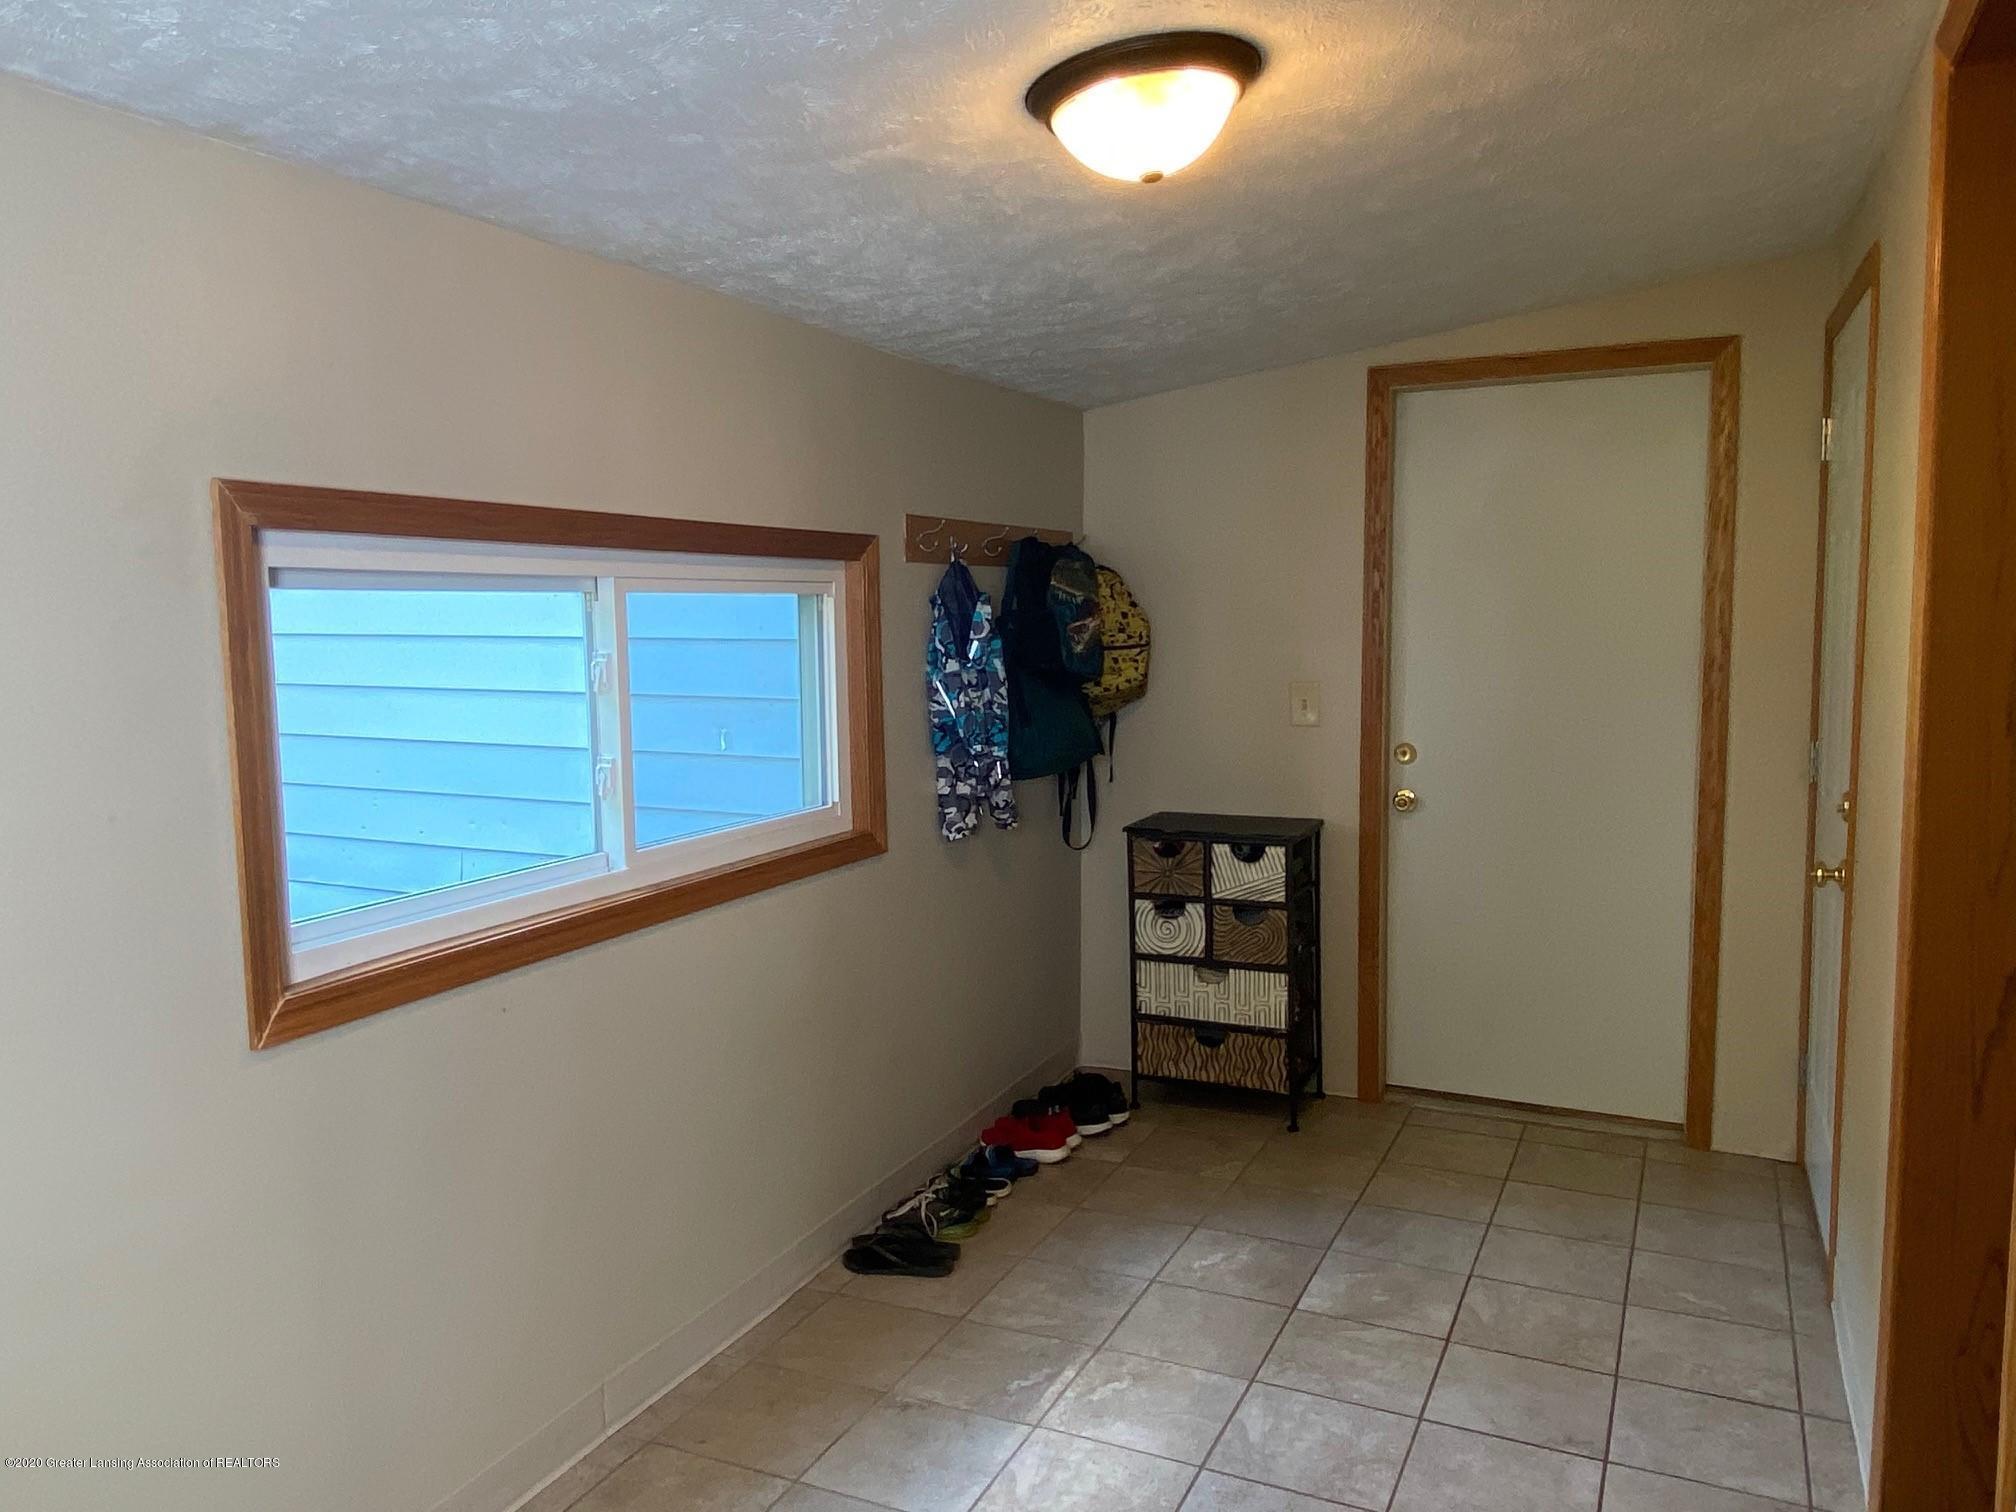 624 E Grand River Rd - Mud Room1 - 3